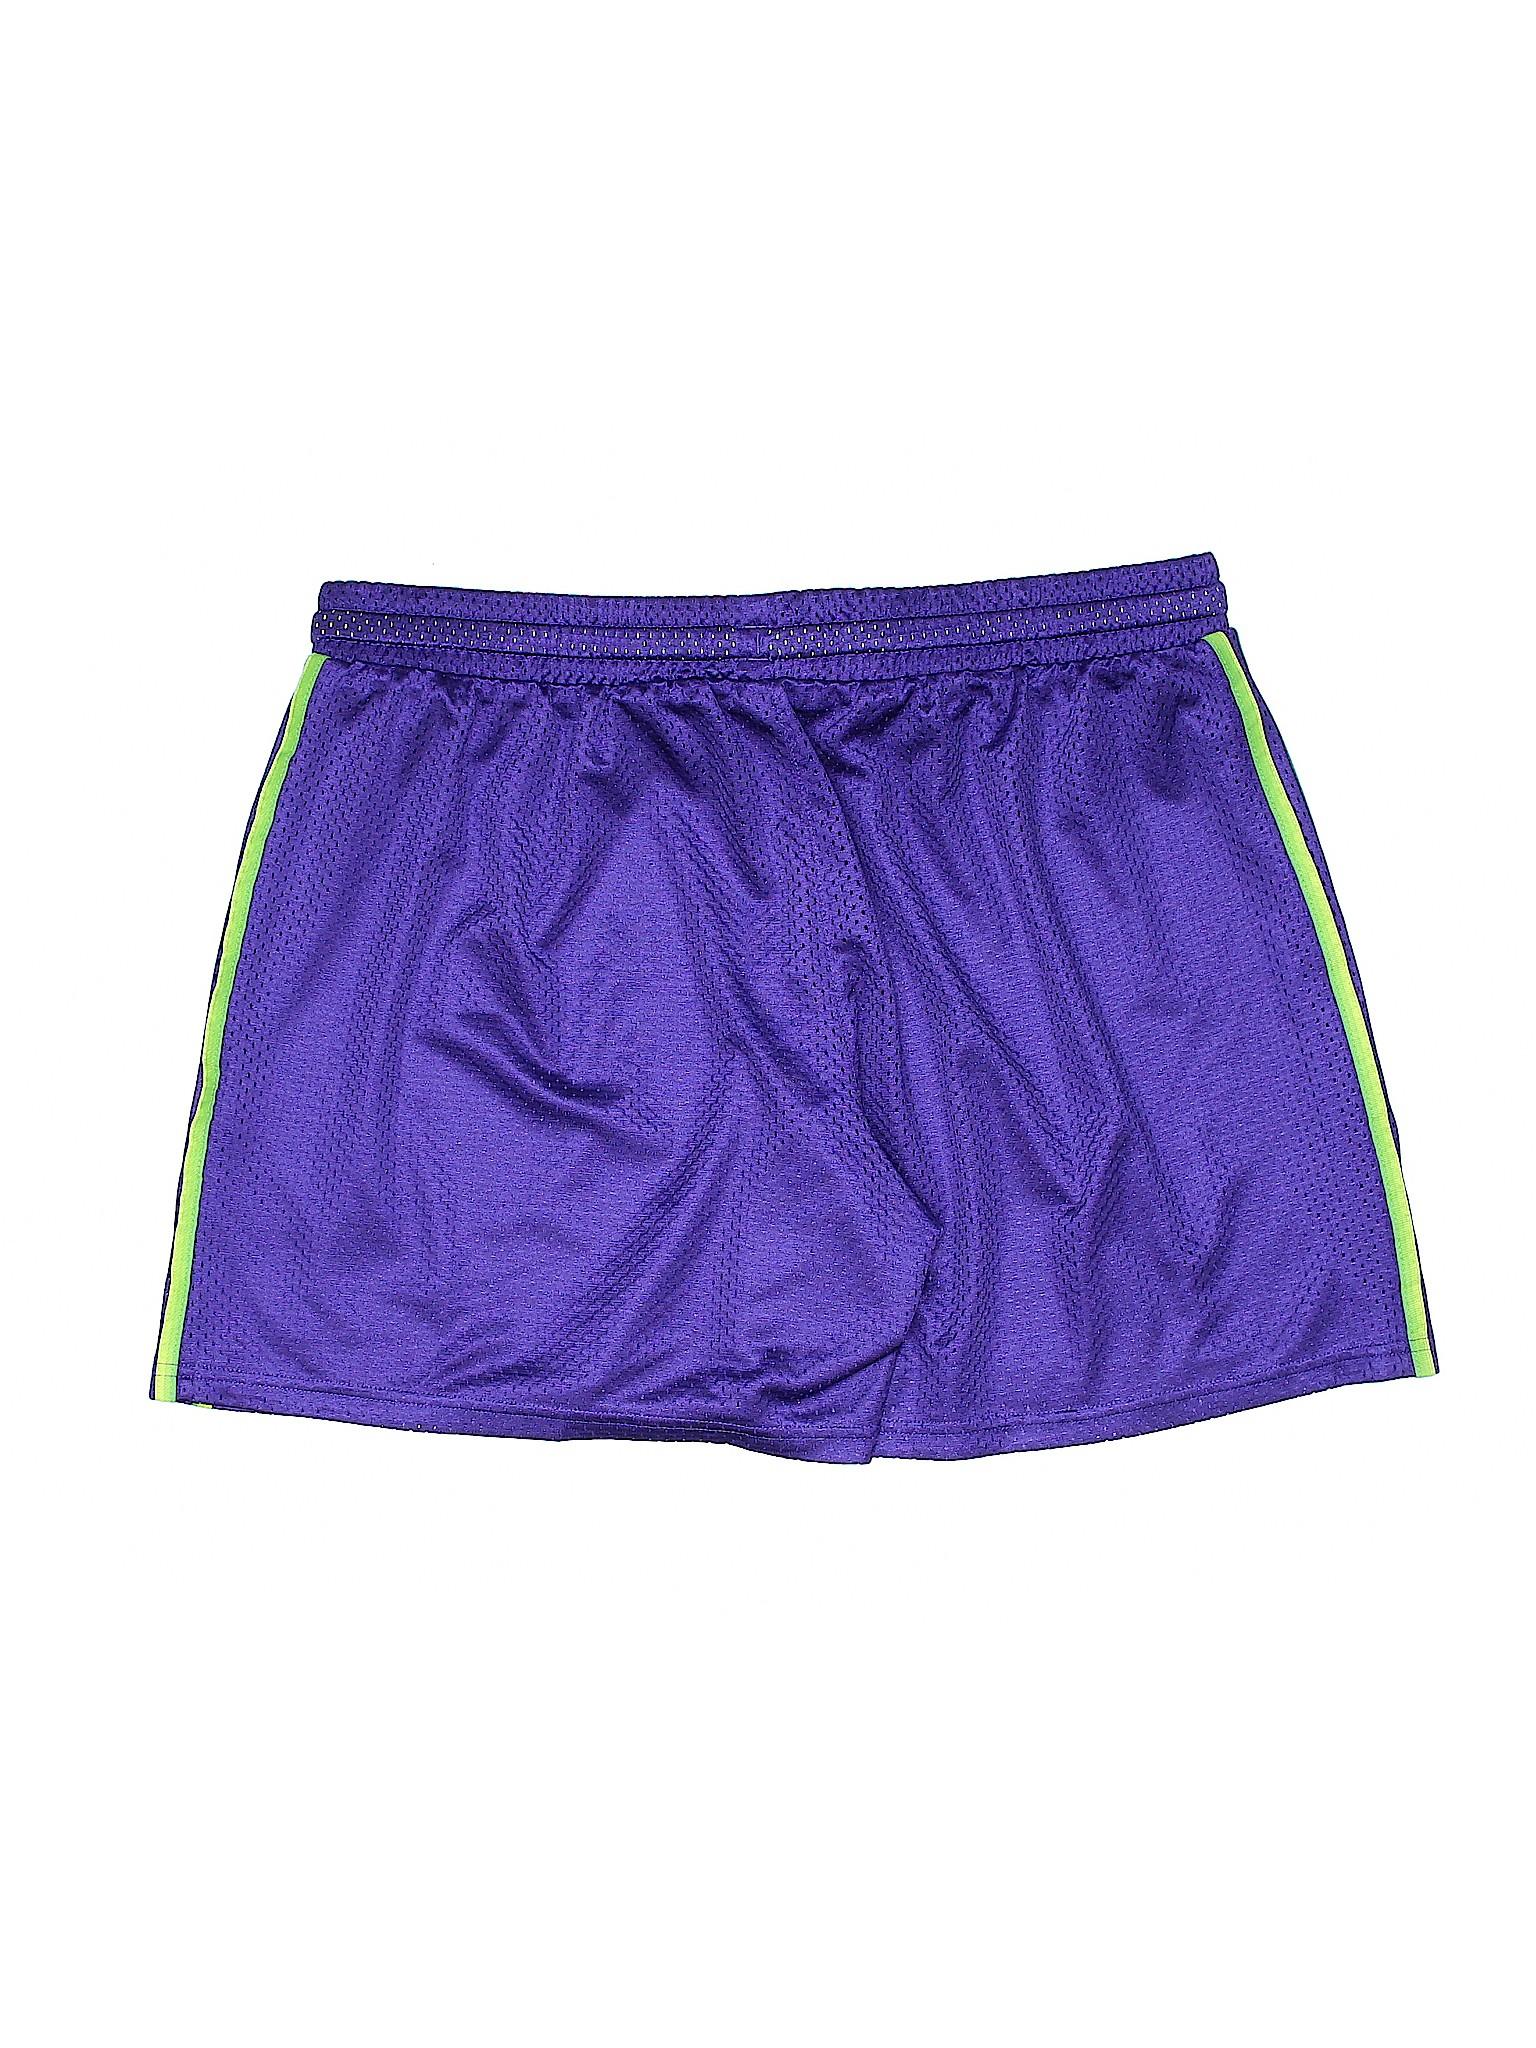 Athletic Shorts Boutique Adidas Boutique Athletic Adidas ZCn1xwaq